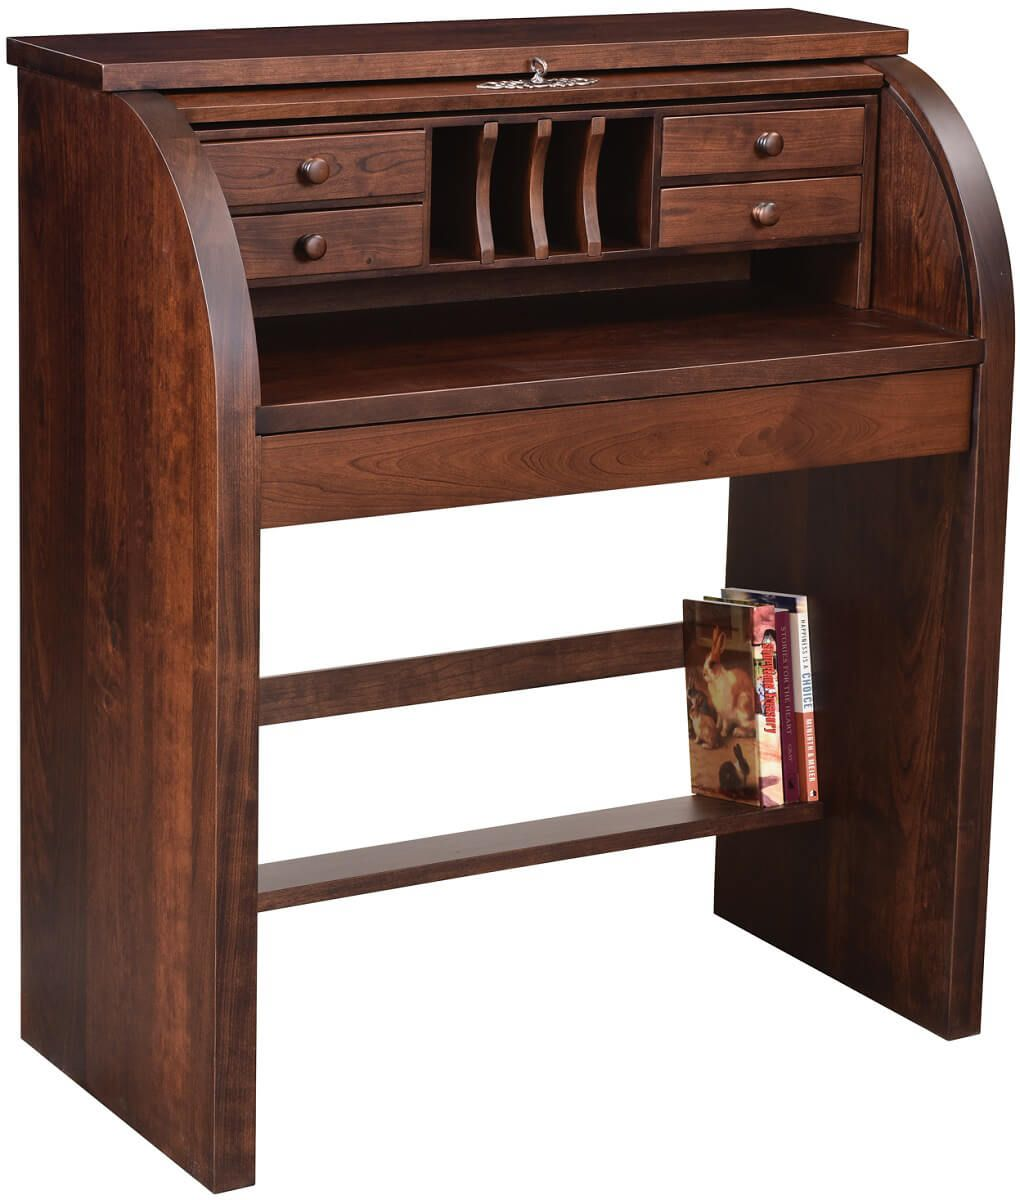 Gardner Roll Top Desk